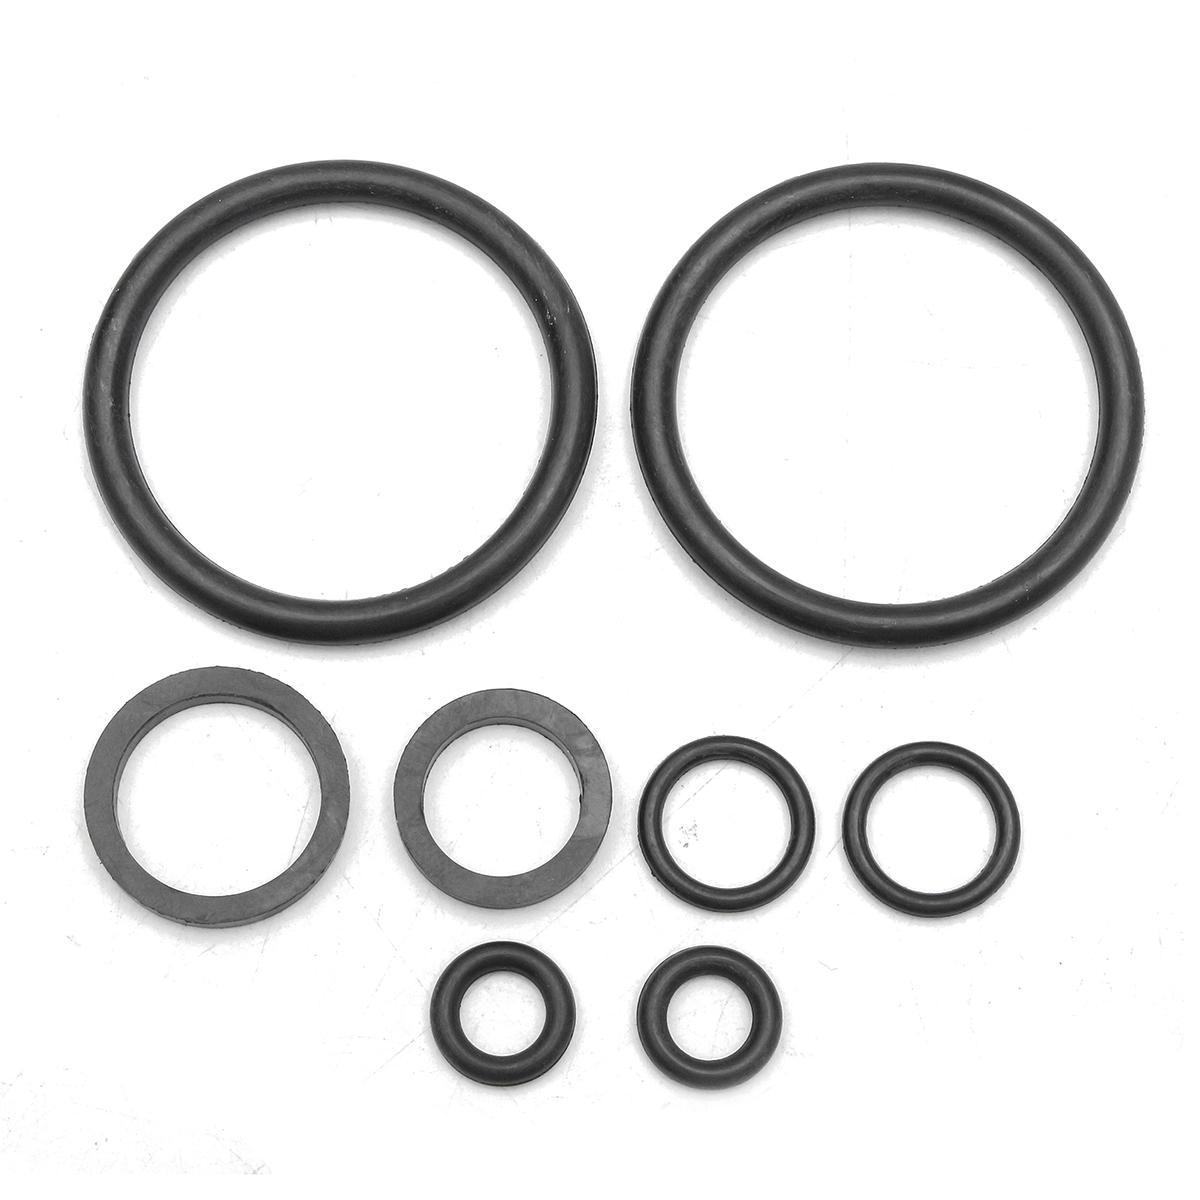 70cc Cylinder Piston Gasket Rings Motor Kit For Atv Honda Atc70 Trx70 4 Wheeler Sale